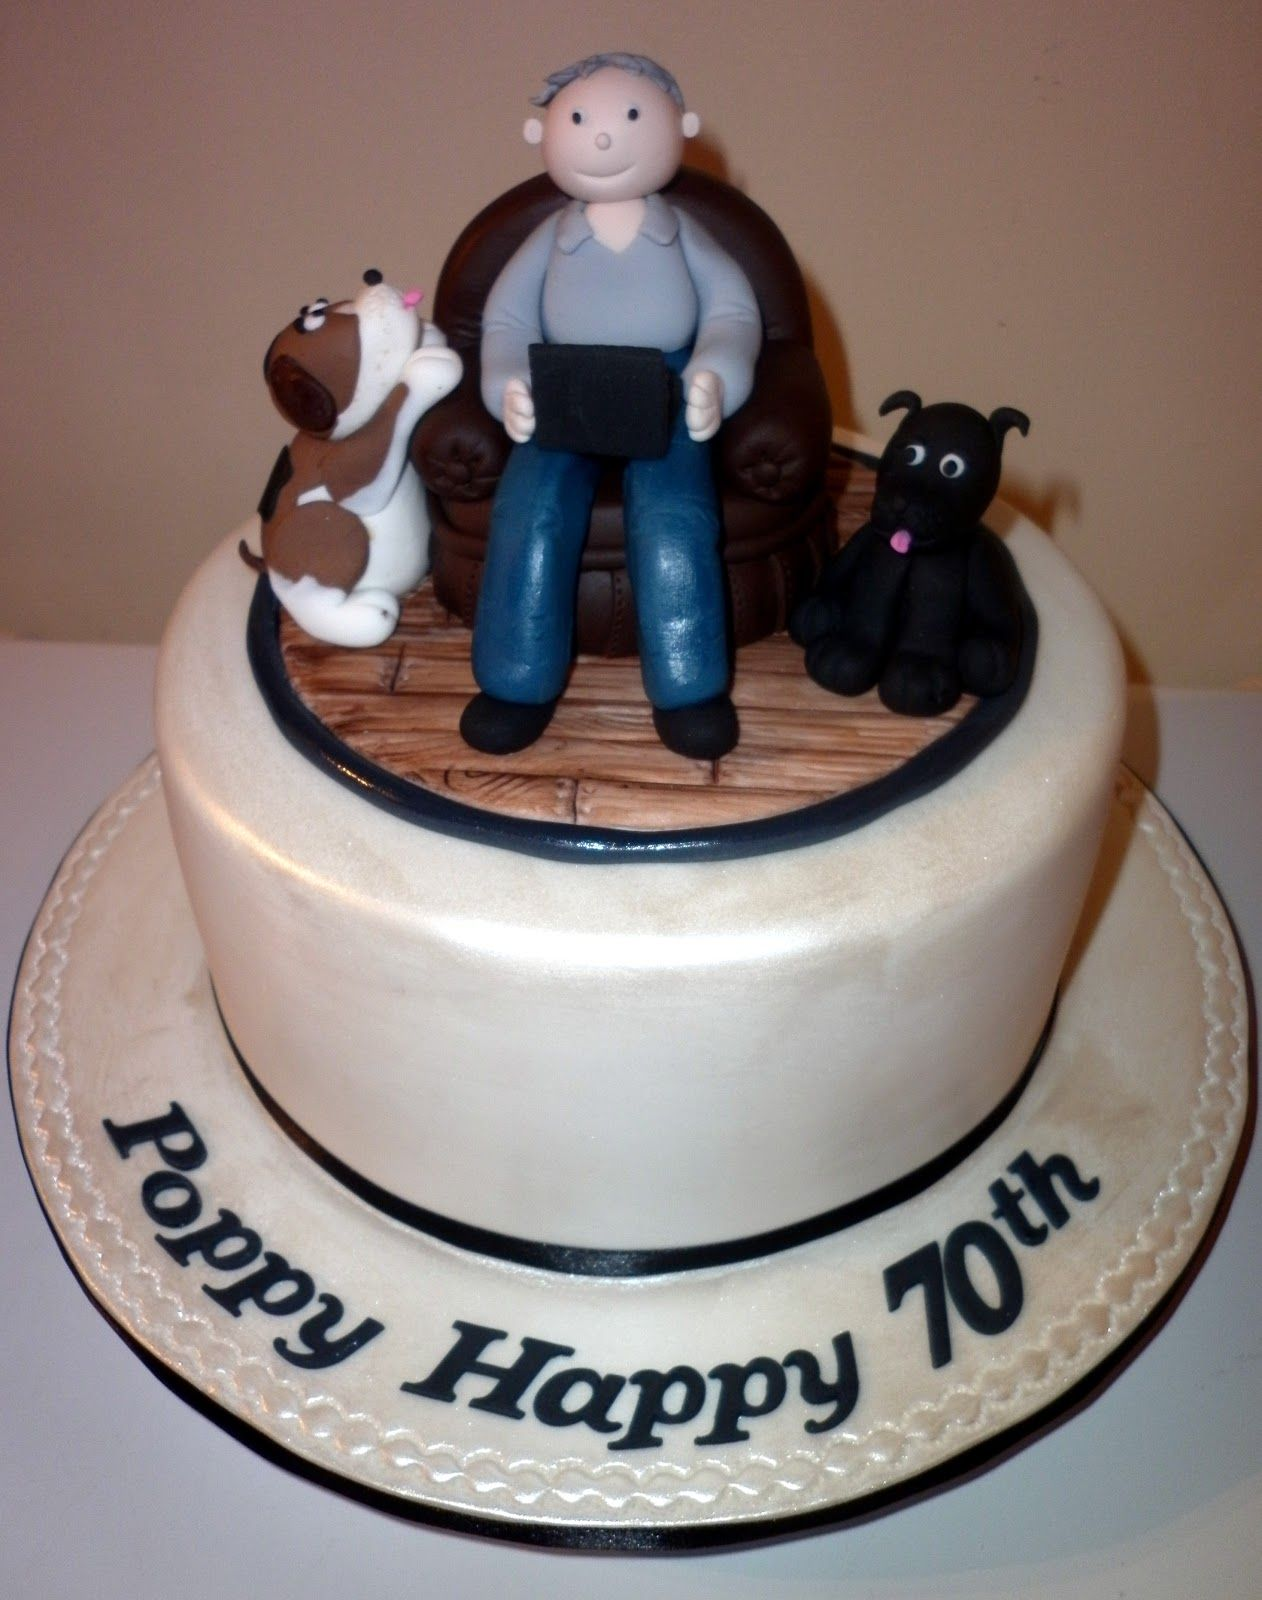 mens 70th birthday cake ideas Cake Recipe